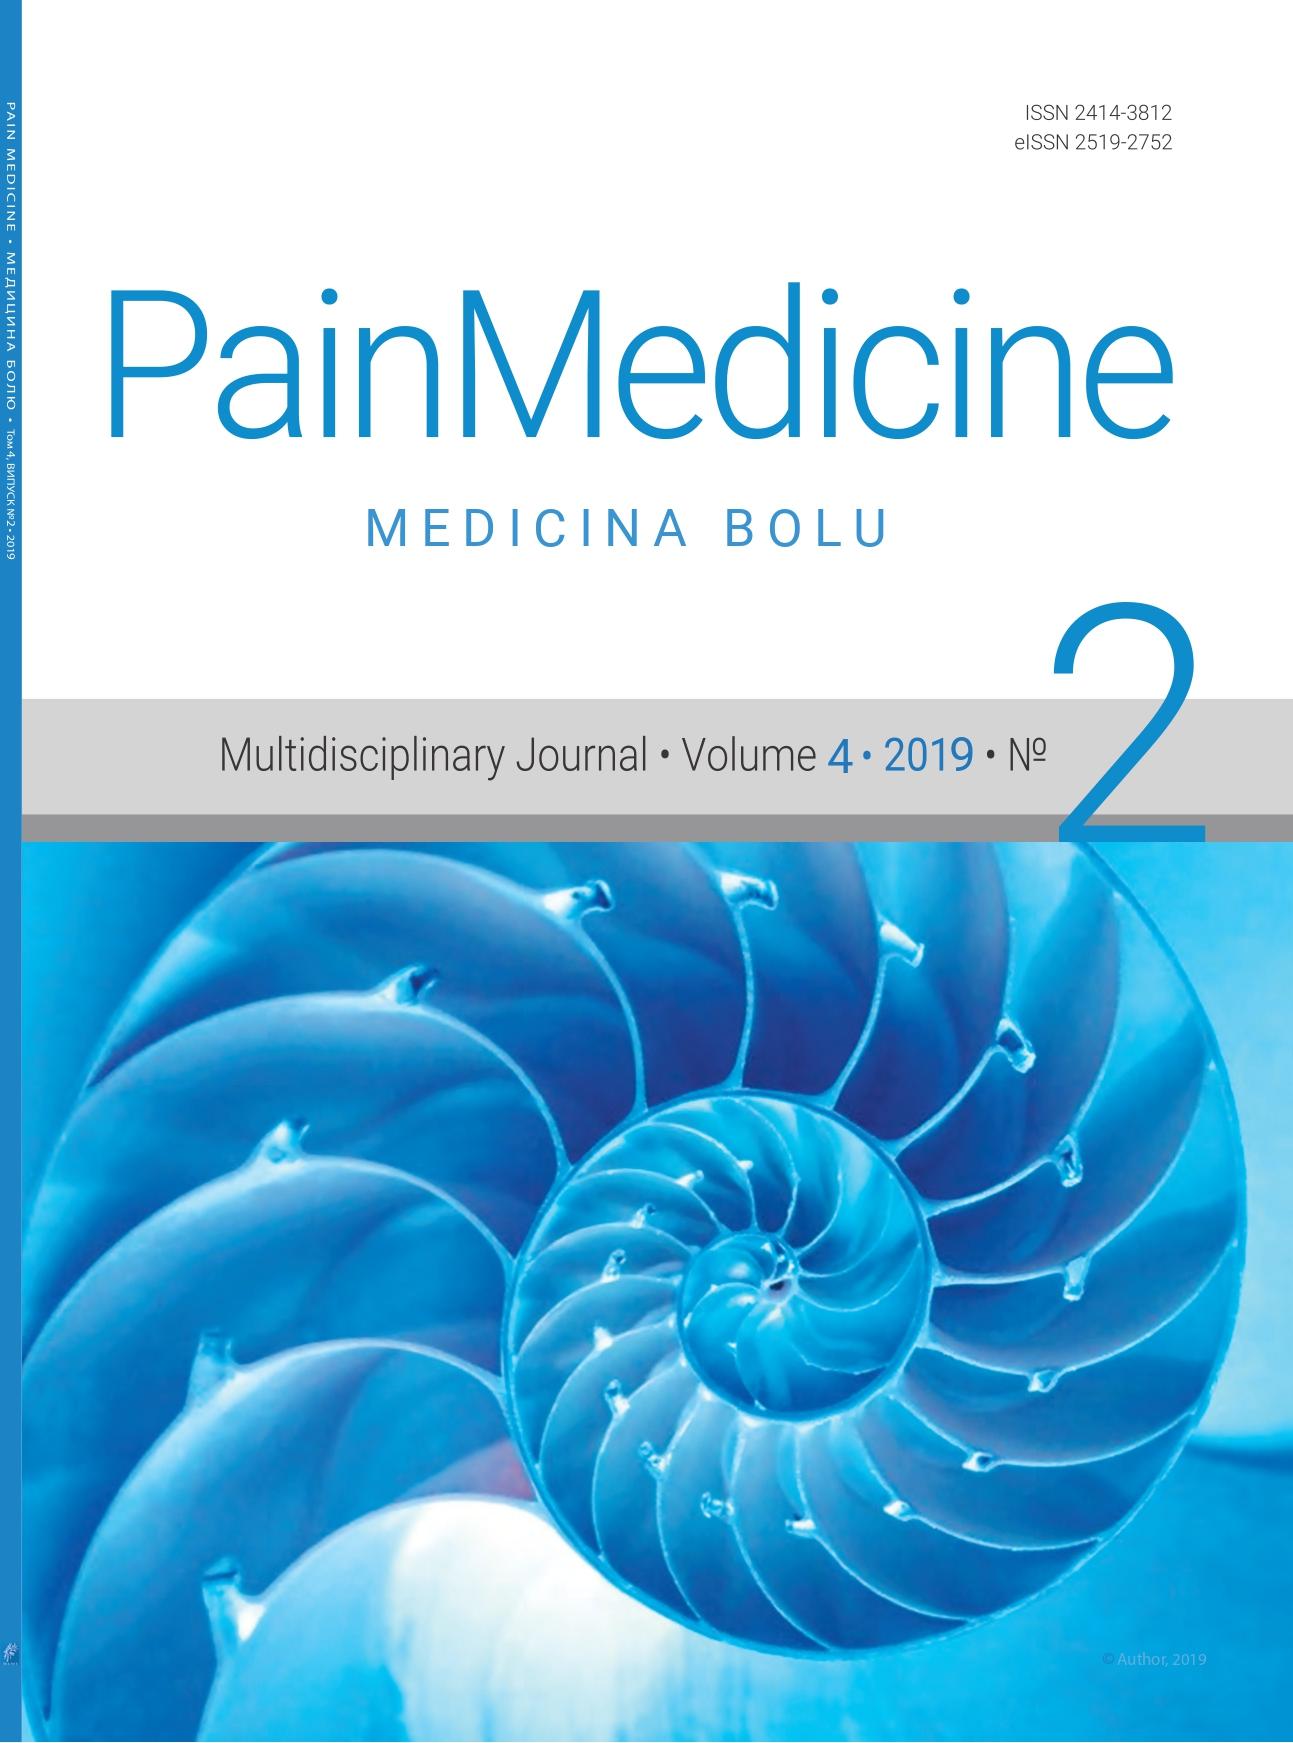 Pain medicine #2 2019